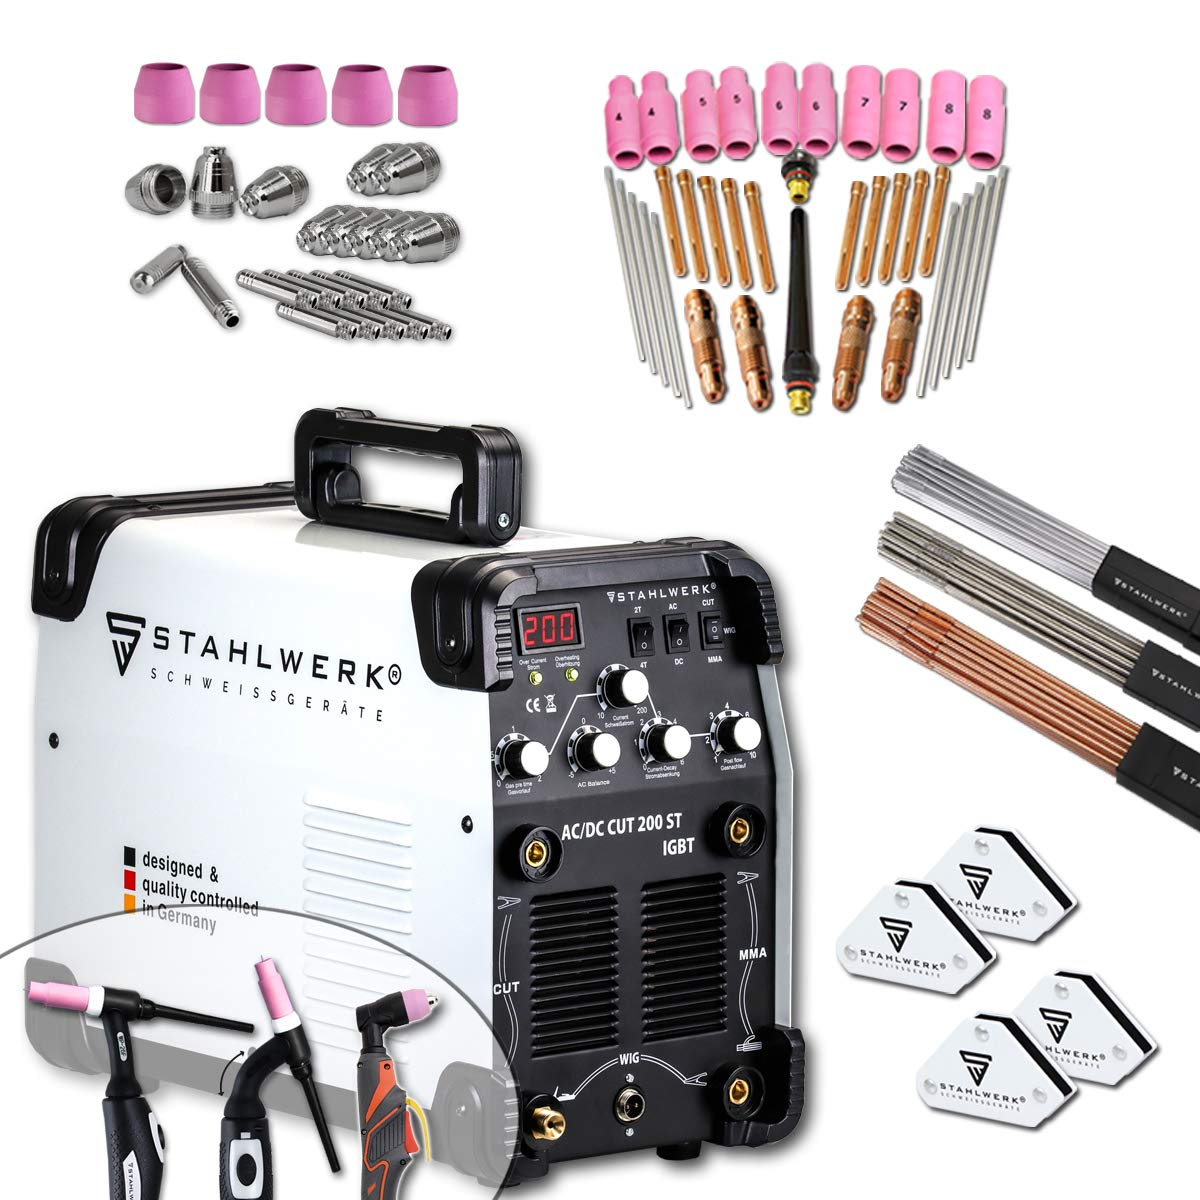 Keramikkappen f/ür WSD-200 CUT Plasmaschneider-Brenner Elektroden Plasmad/üsen STAHLWERK WSD-200 Plasmazubeh/ör Verschlei/ßteile Set 25-teilig